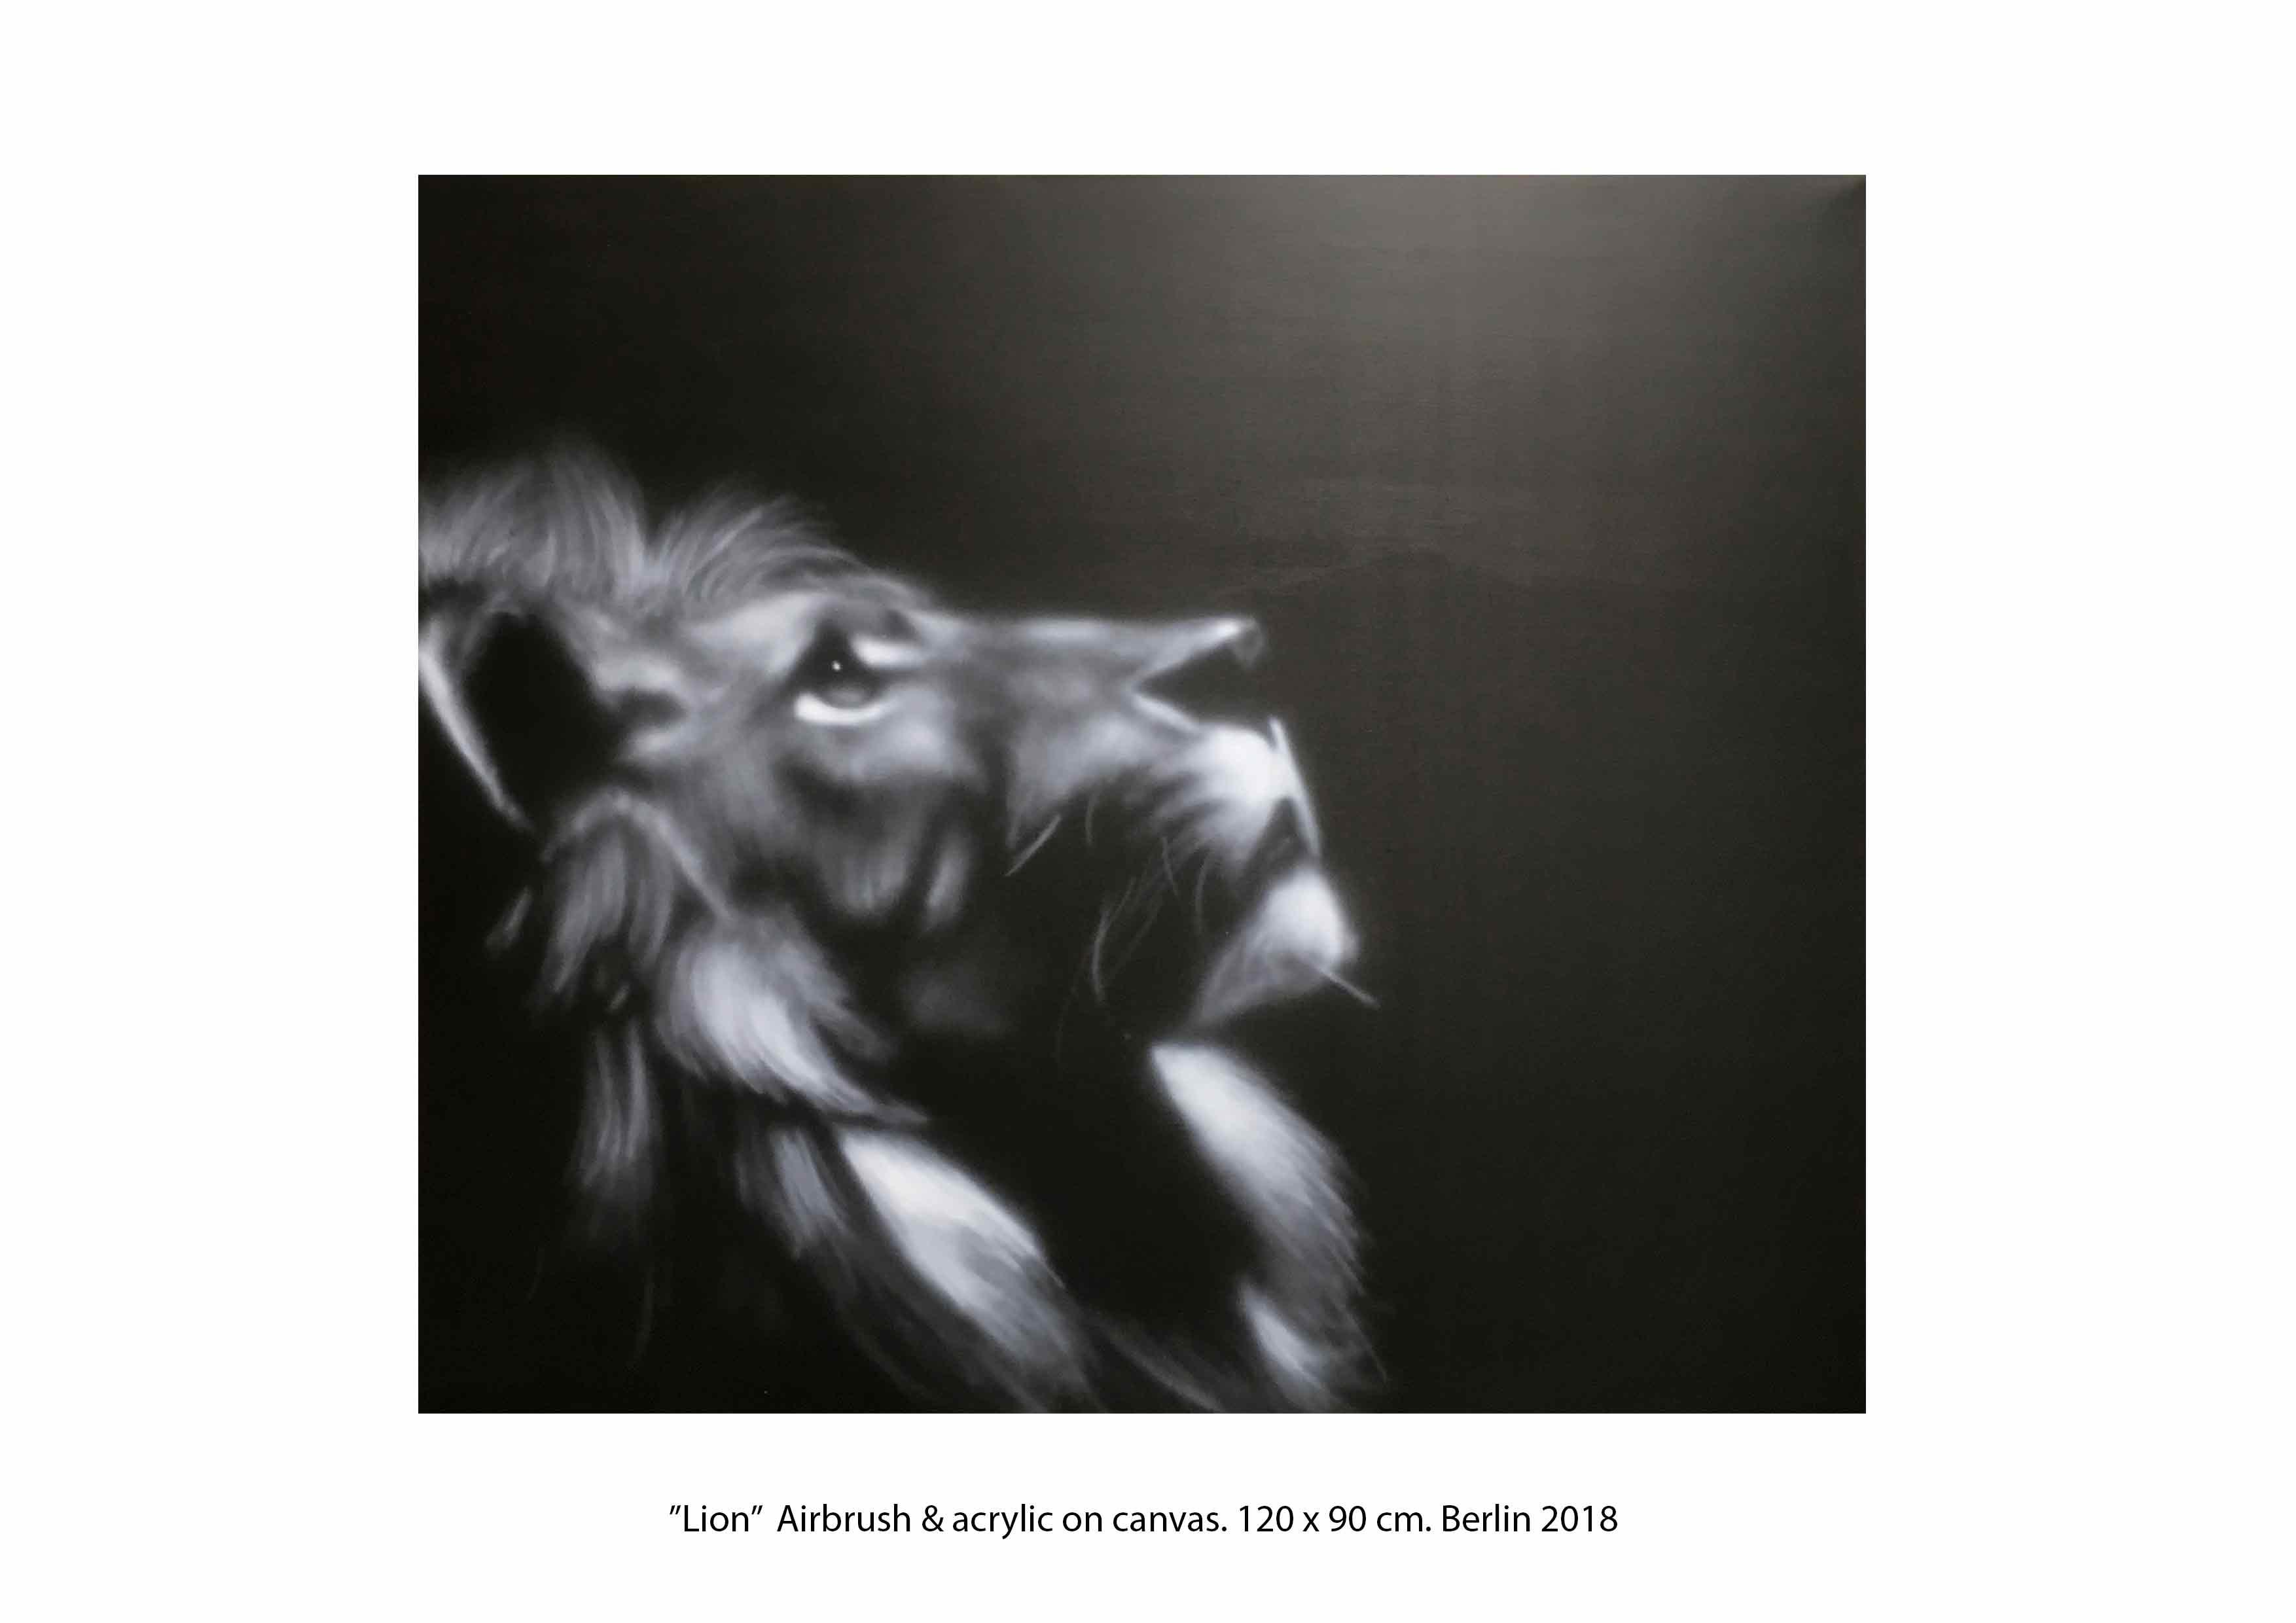 Lion airbrush Victor Landeta